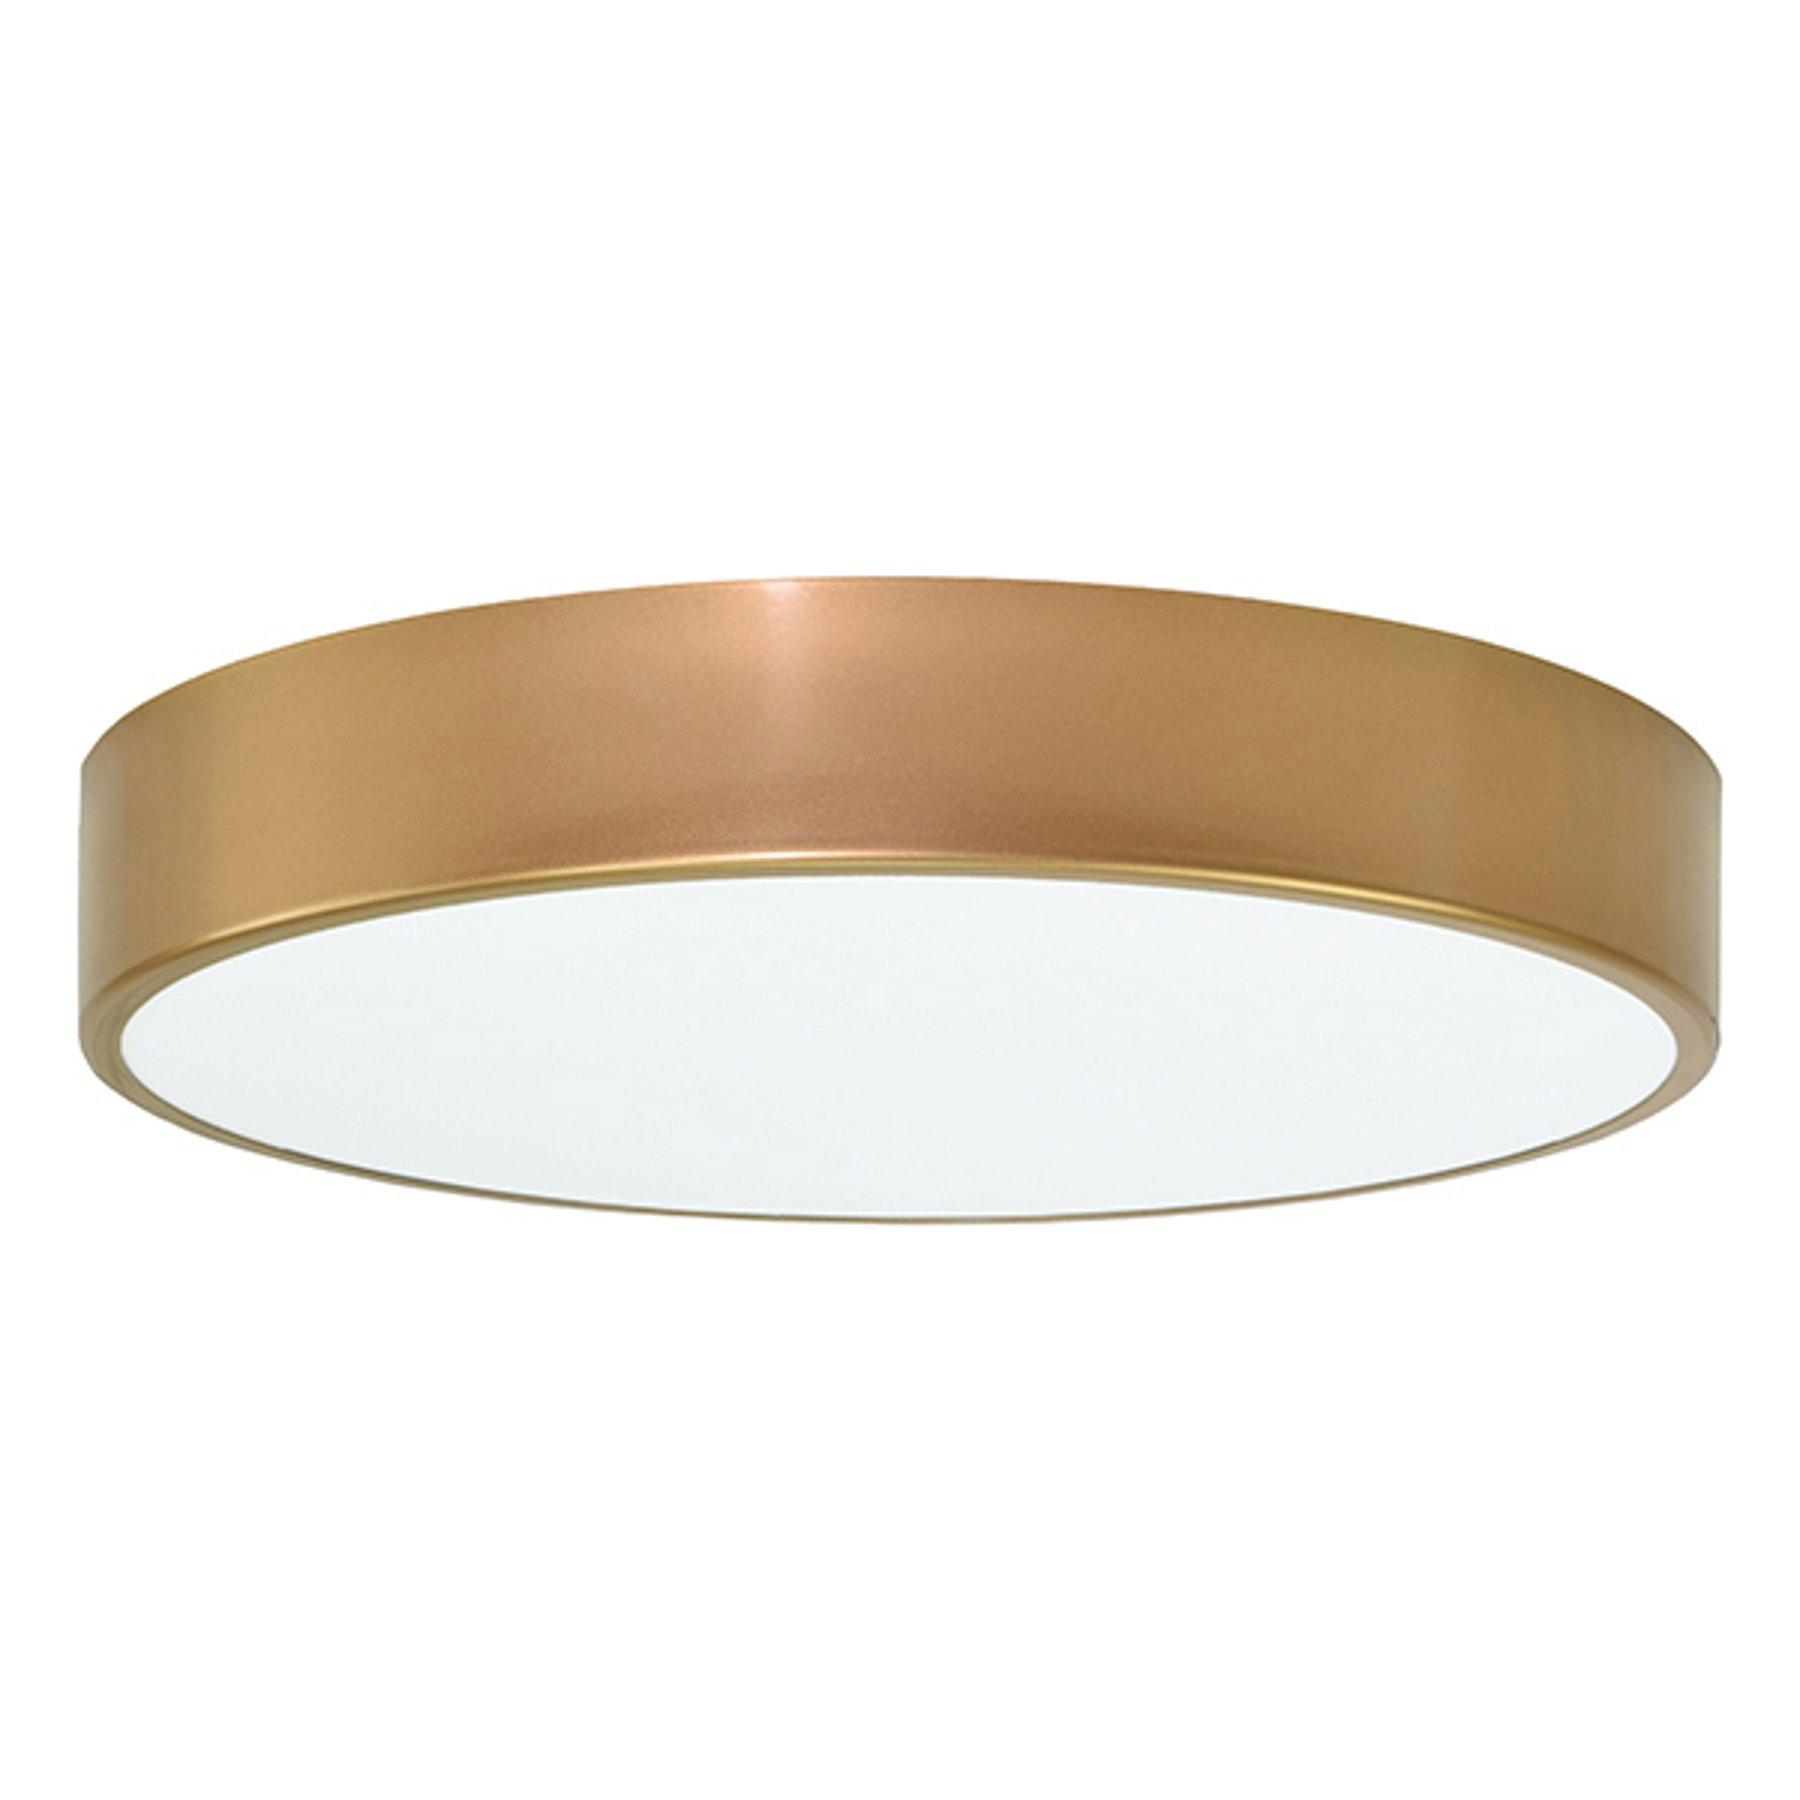 Taklampe Cleo Ø 50 cm, gull